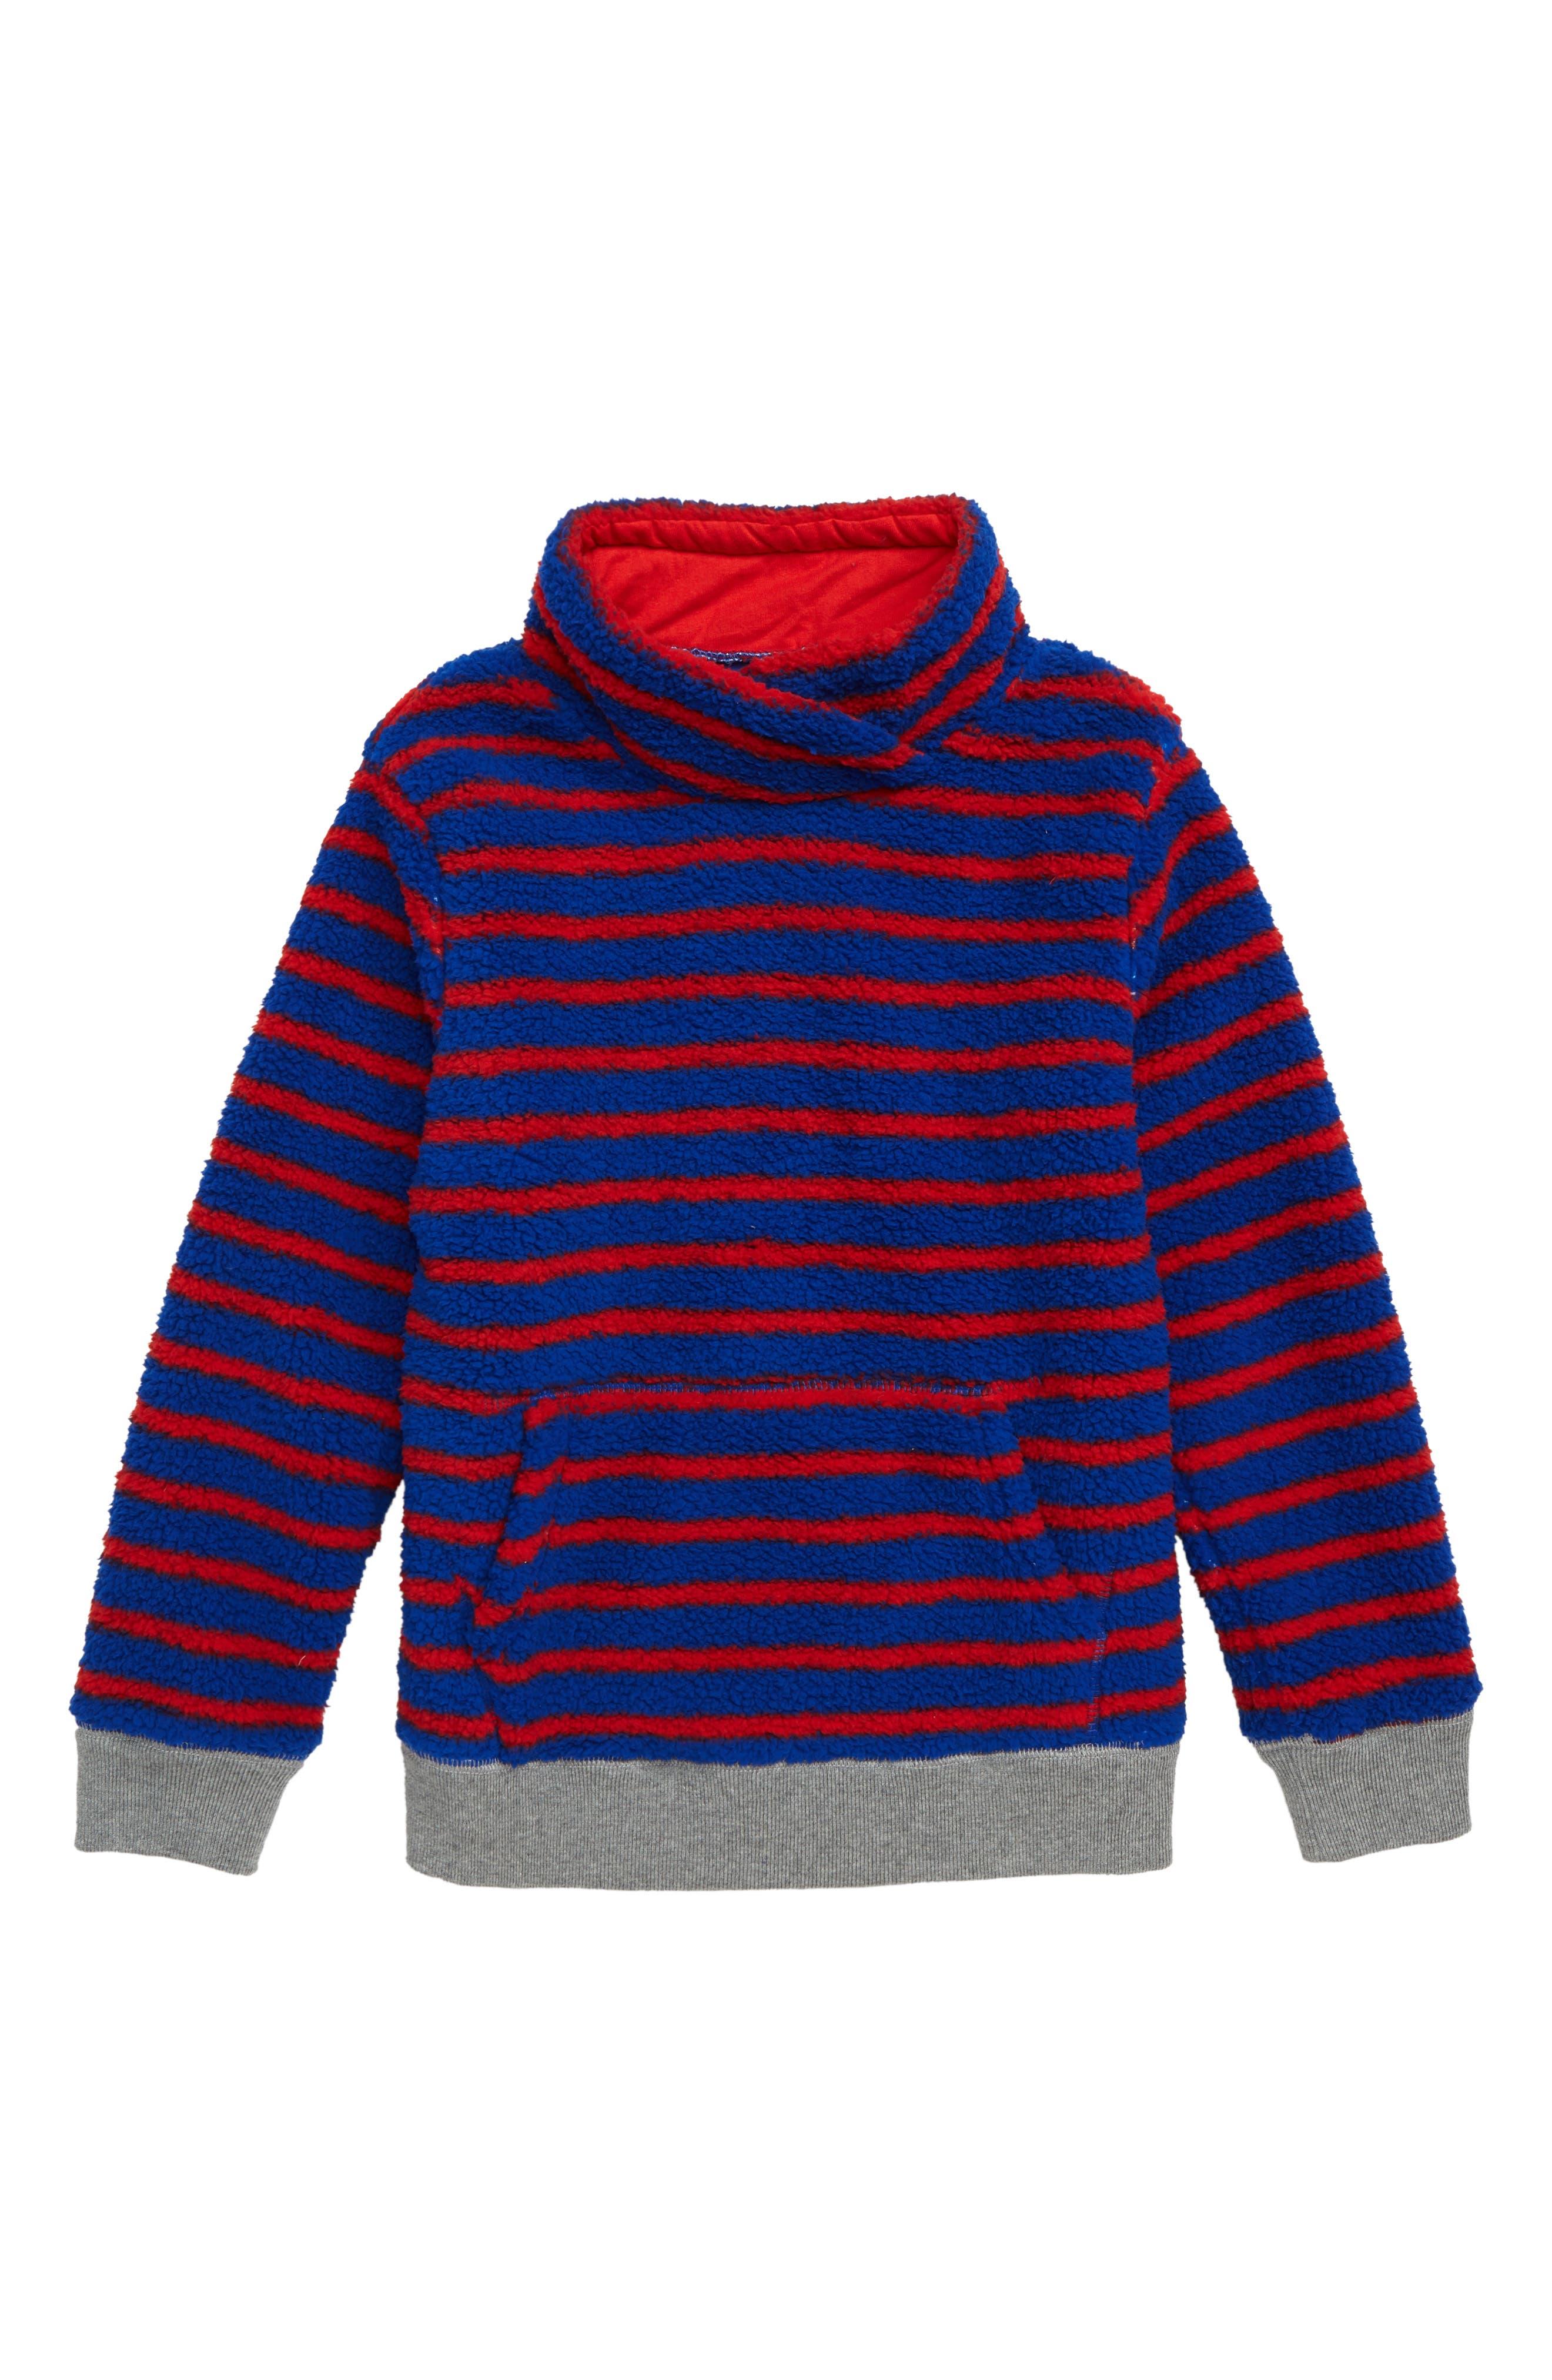 Boys Mini Boden Cosy Teddy Pullover Sweatshirt